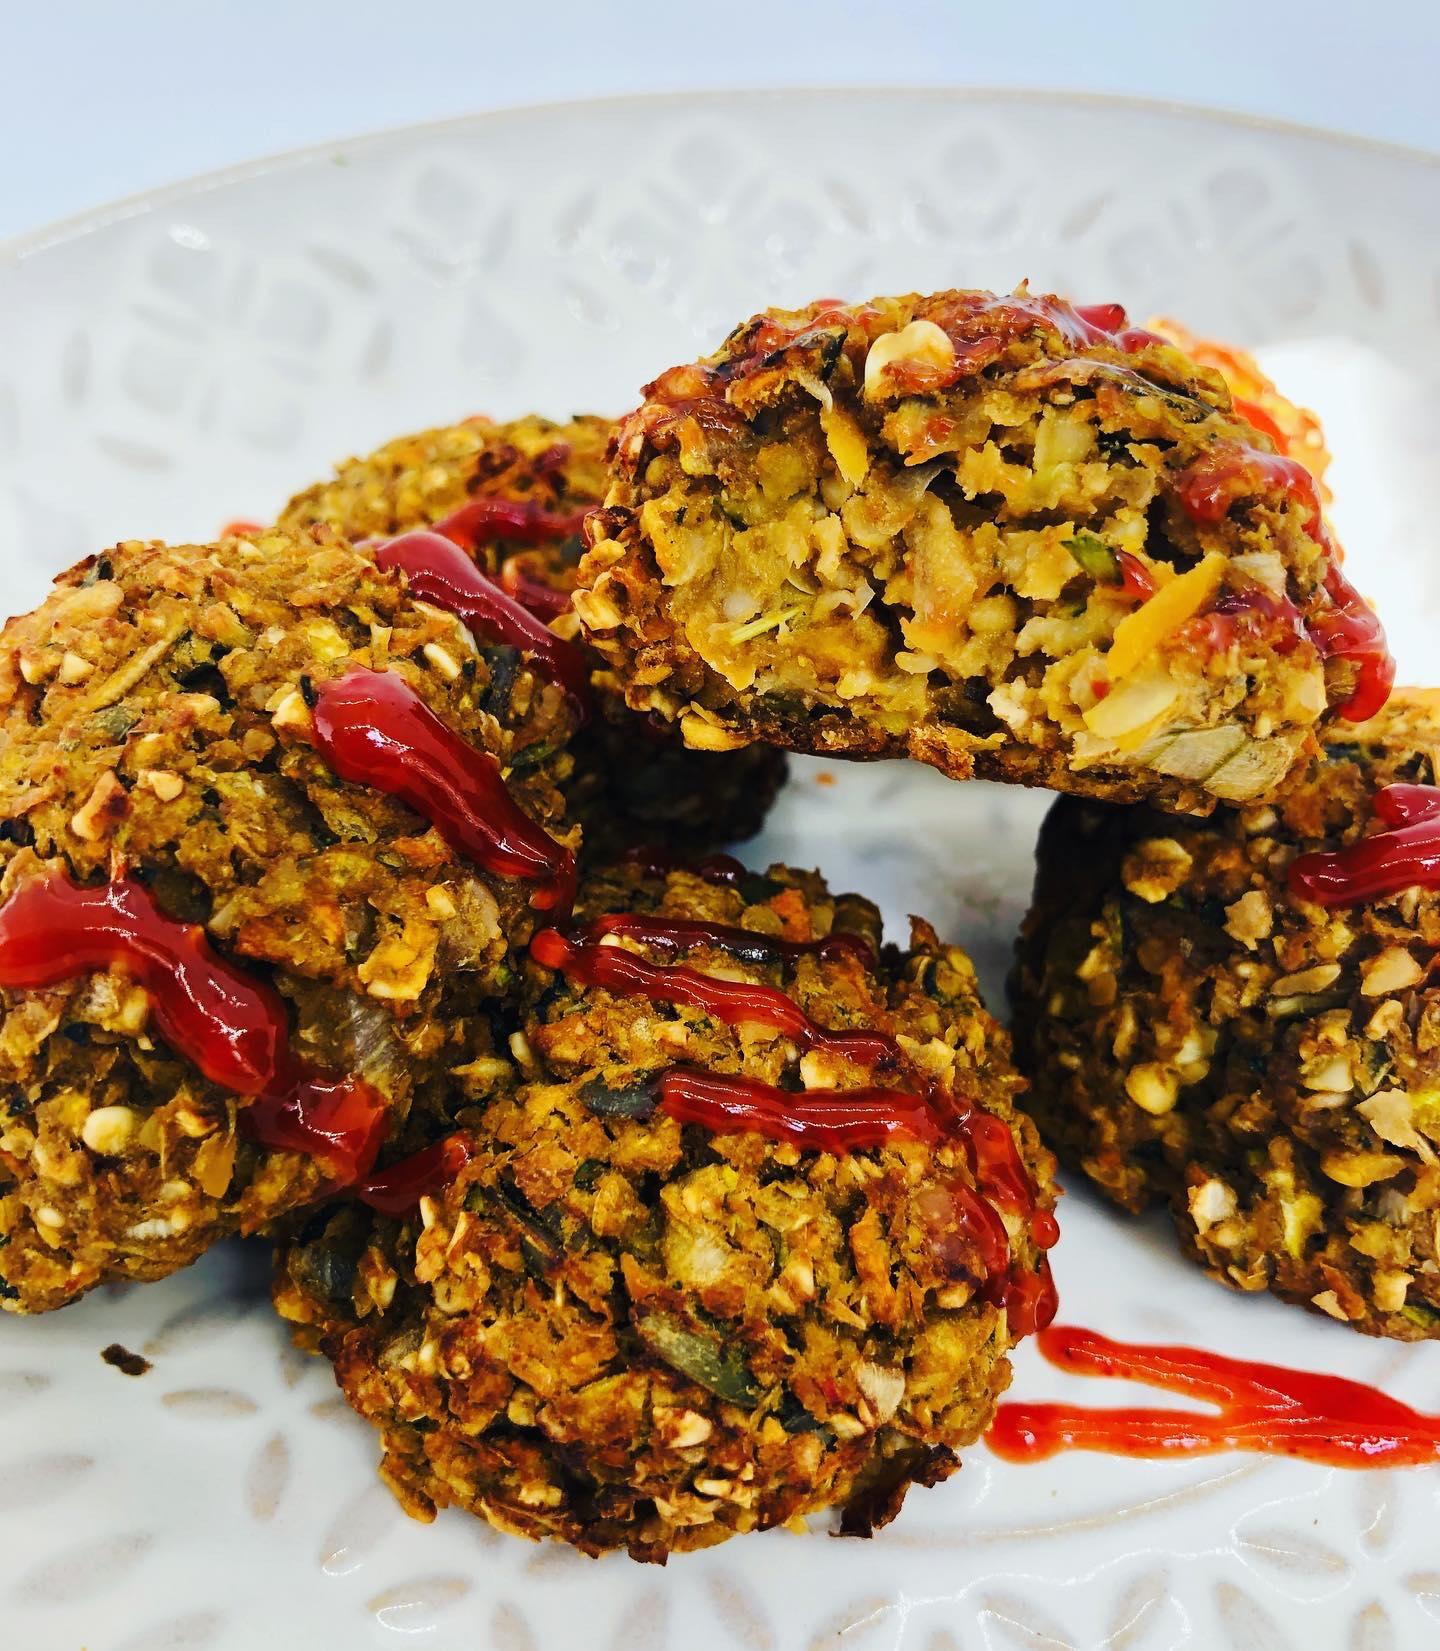 Easy Healthy Vegan Zucchini 'Meatballs' (Oil + Gluten-Free)